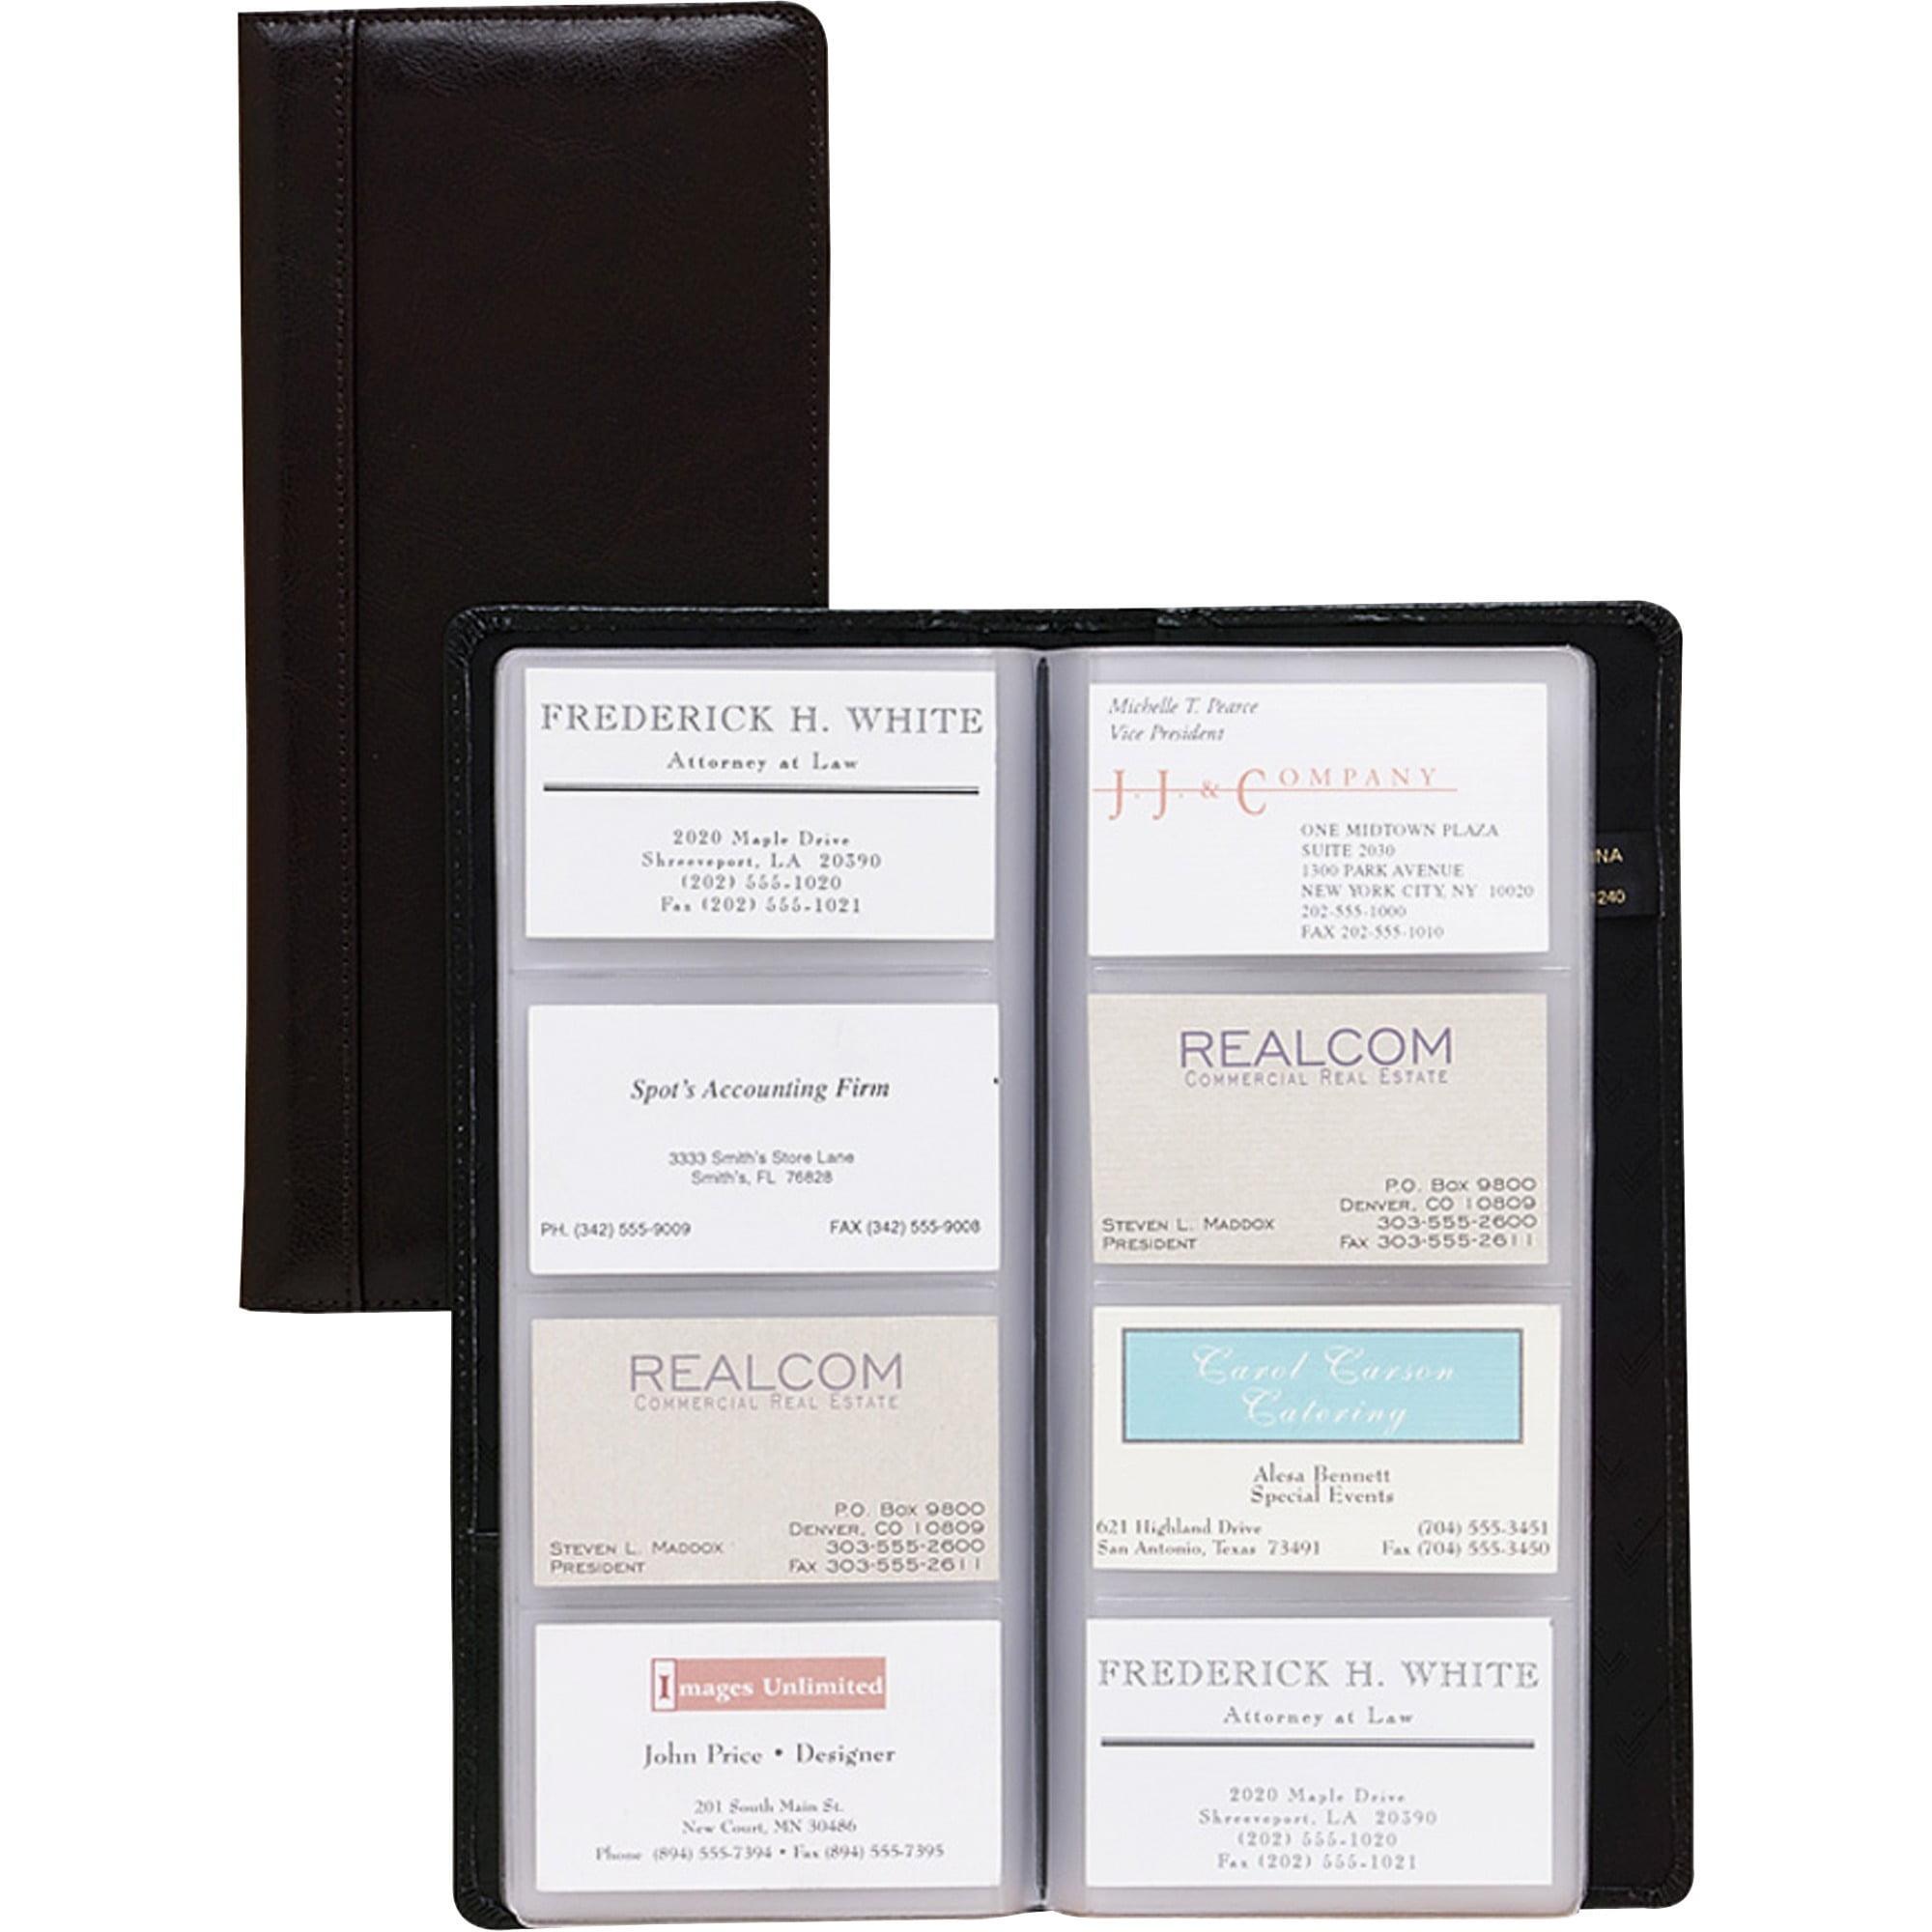 Samsill, SAM81240, Regal Leather Business Card Holders, 1 Each, Black